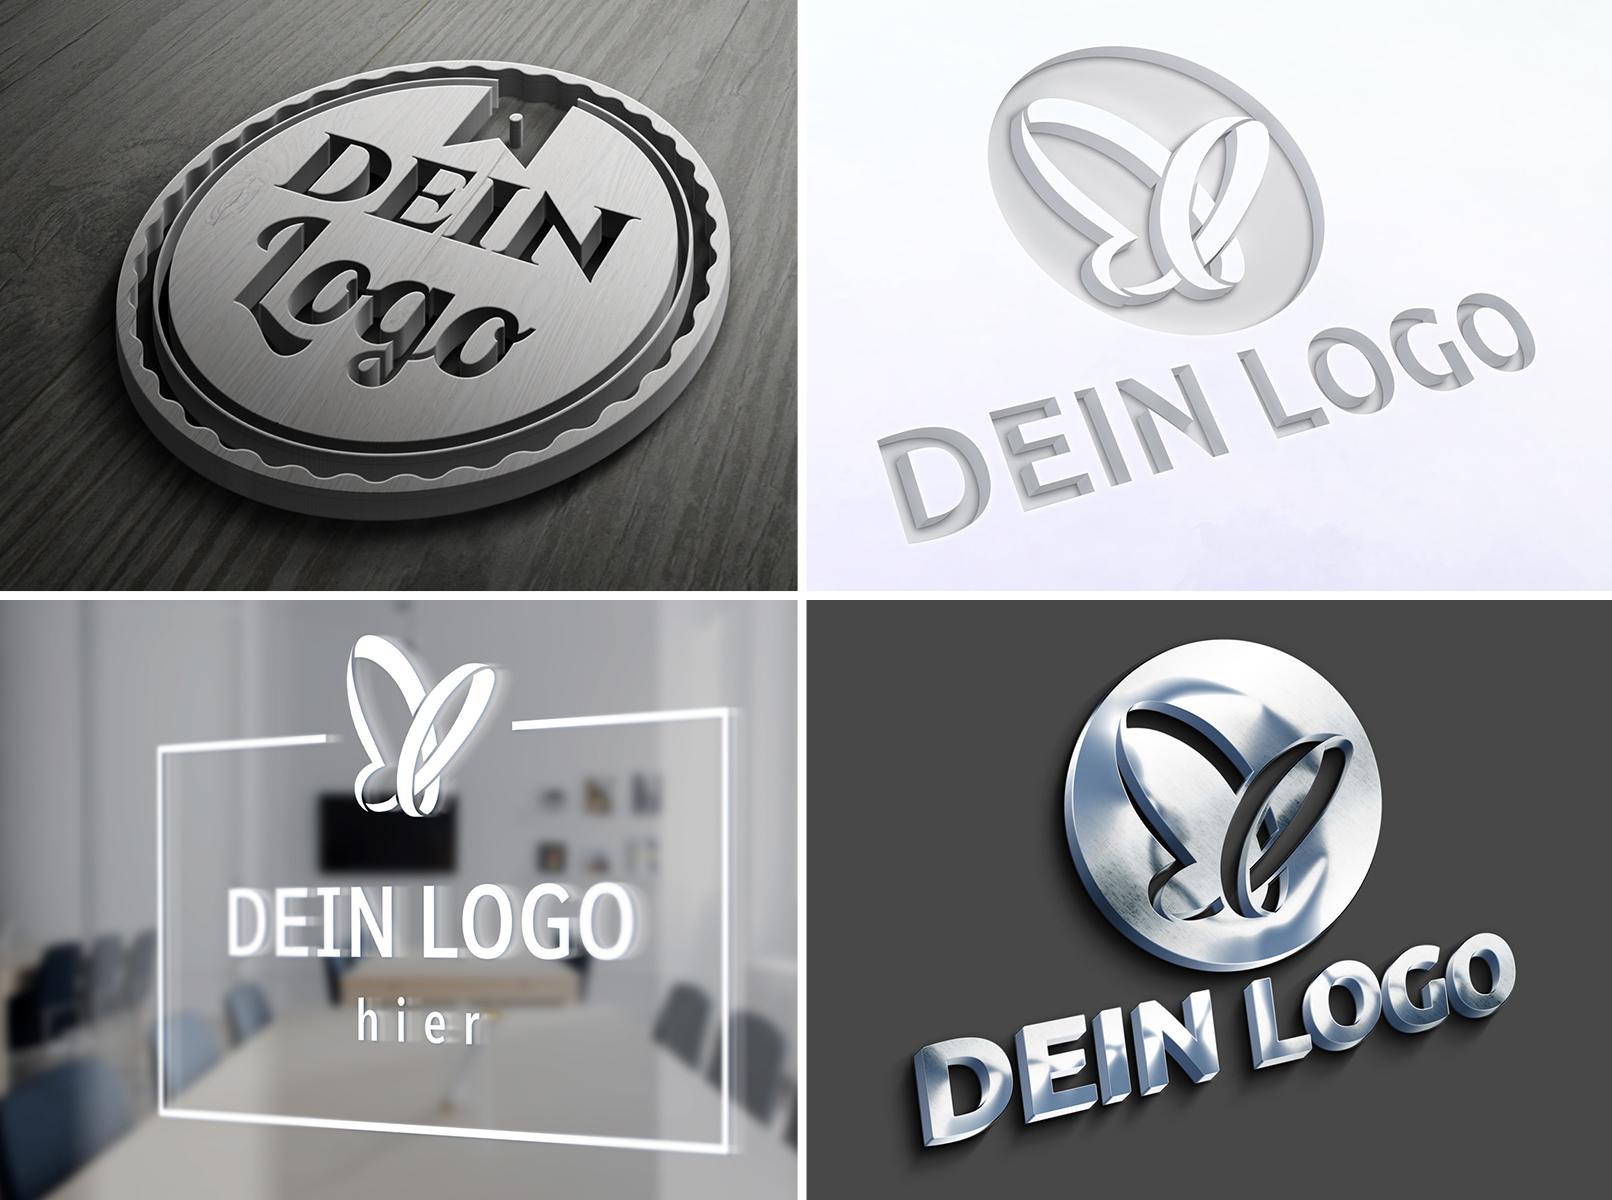 Logo auf Mockup angewandt, u. a. mit 3D-Effekt